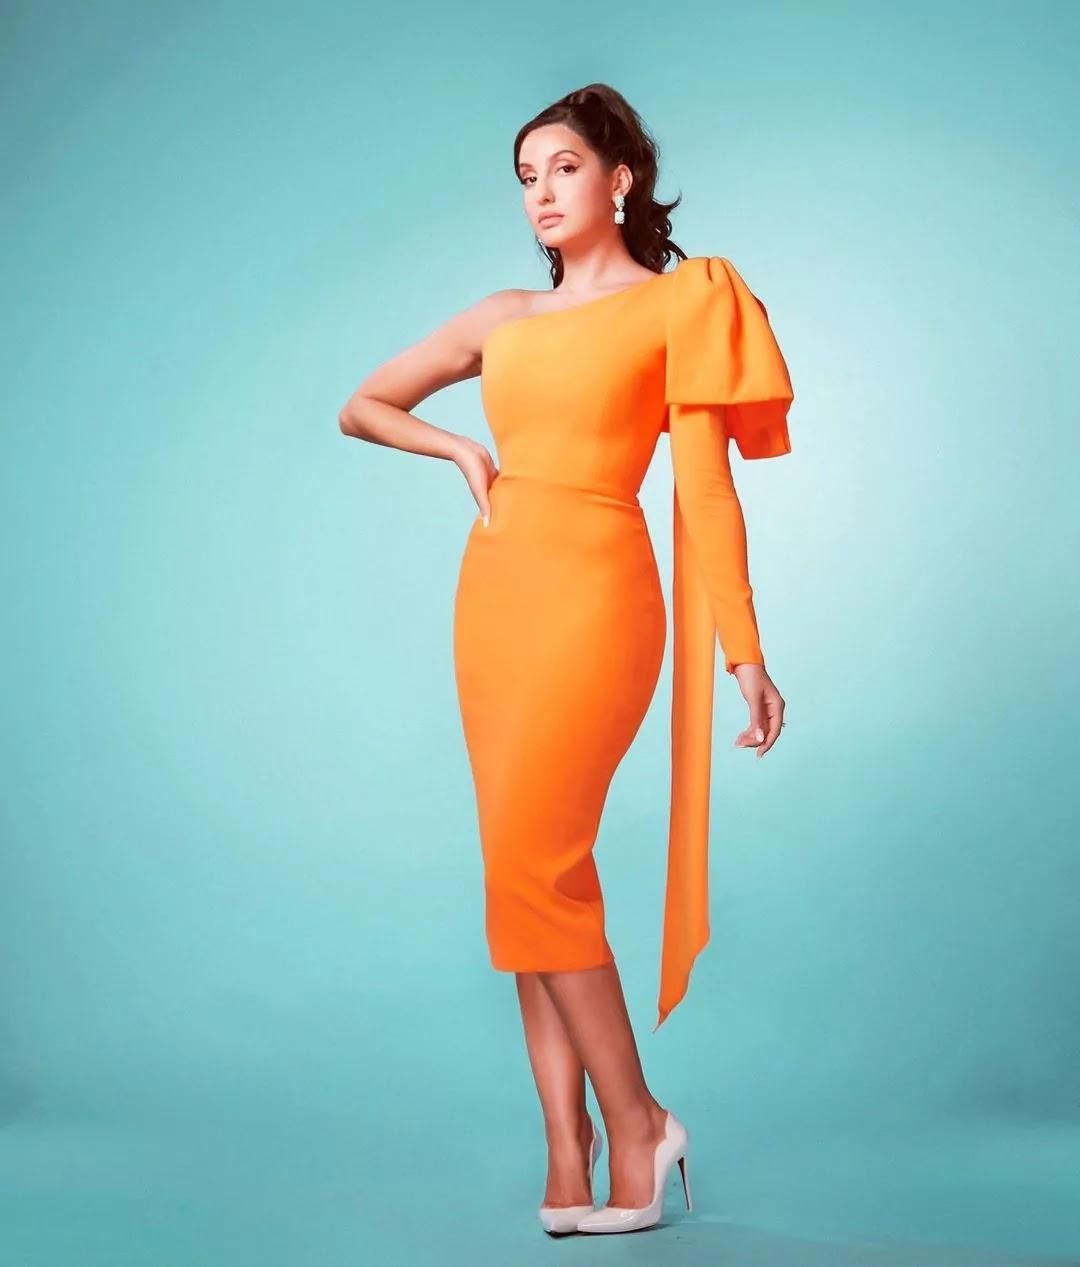 nora-fatehi-hot-looks-in-orange-bodycon-dress